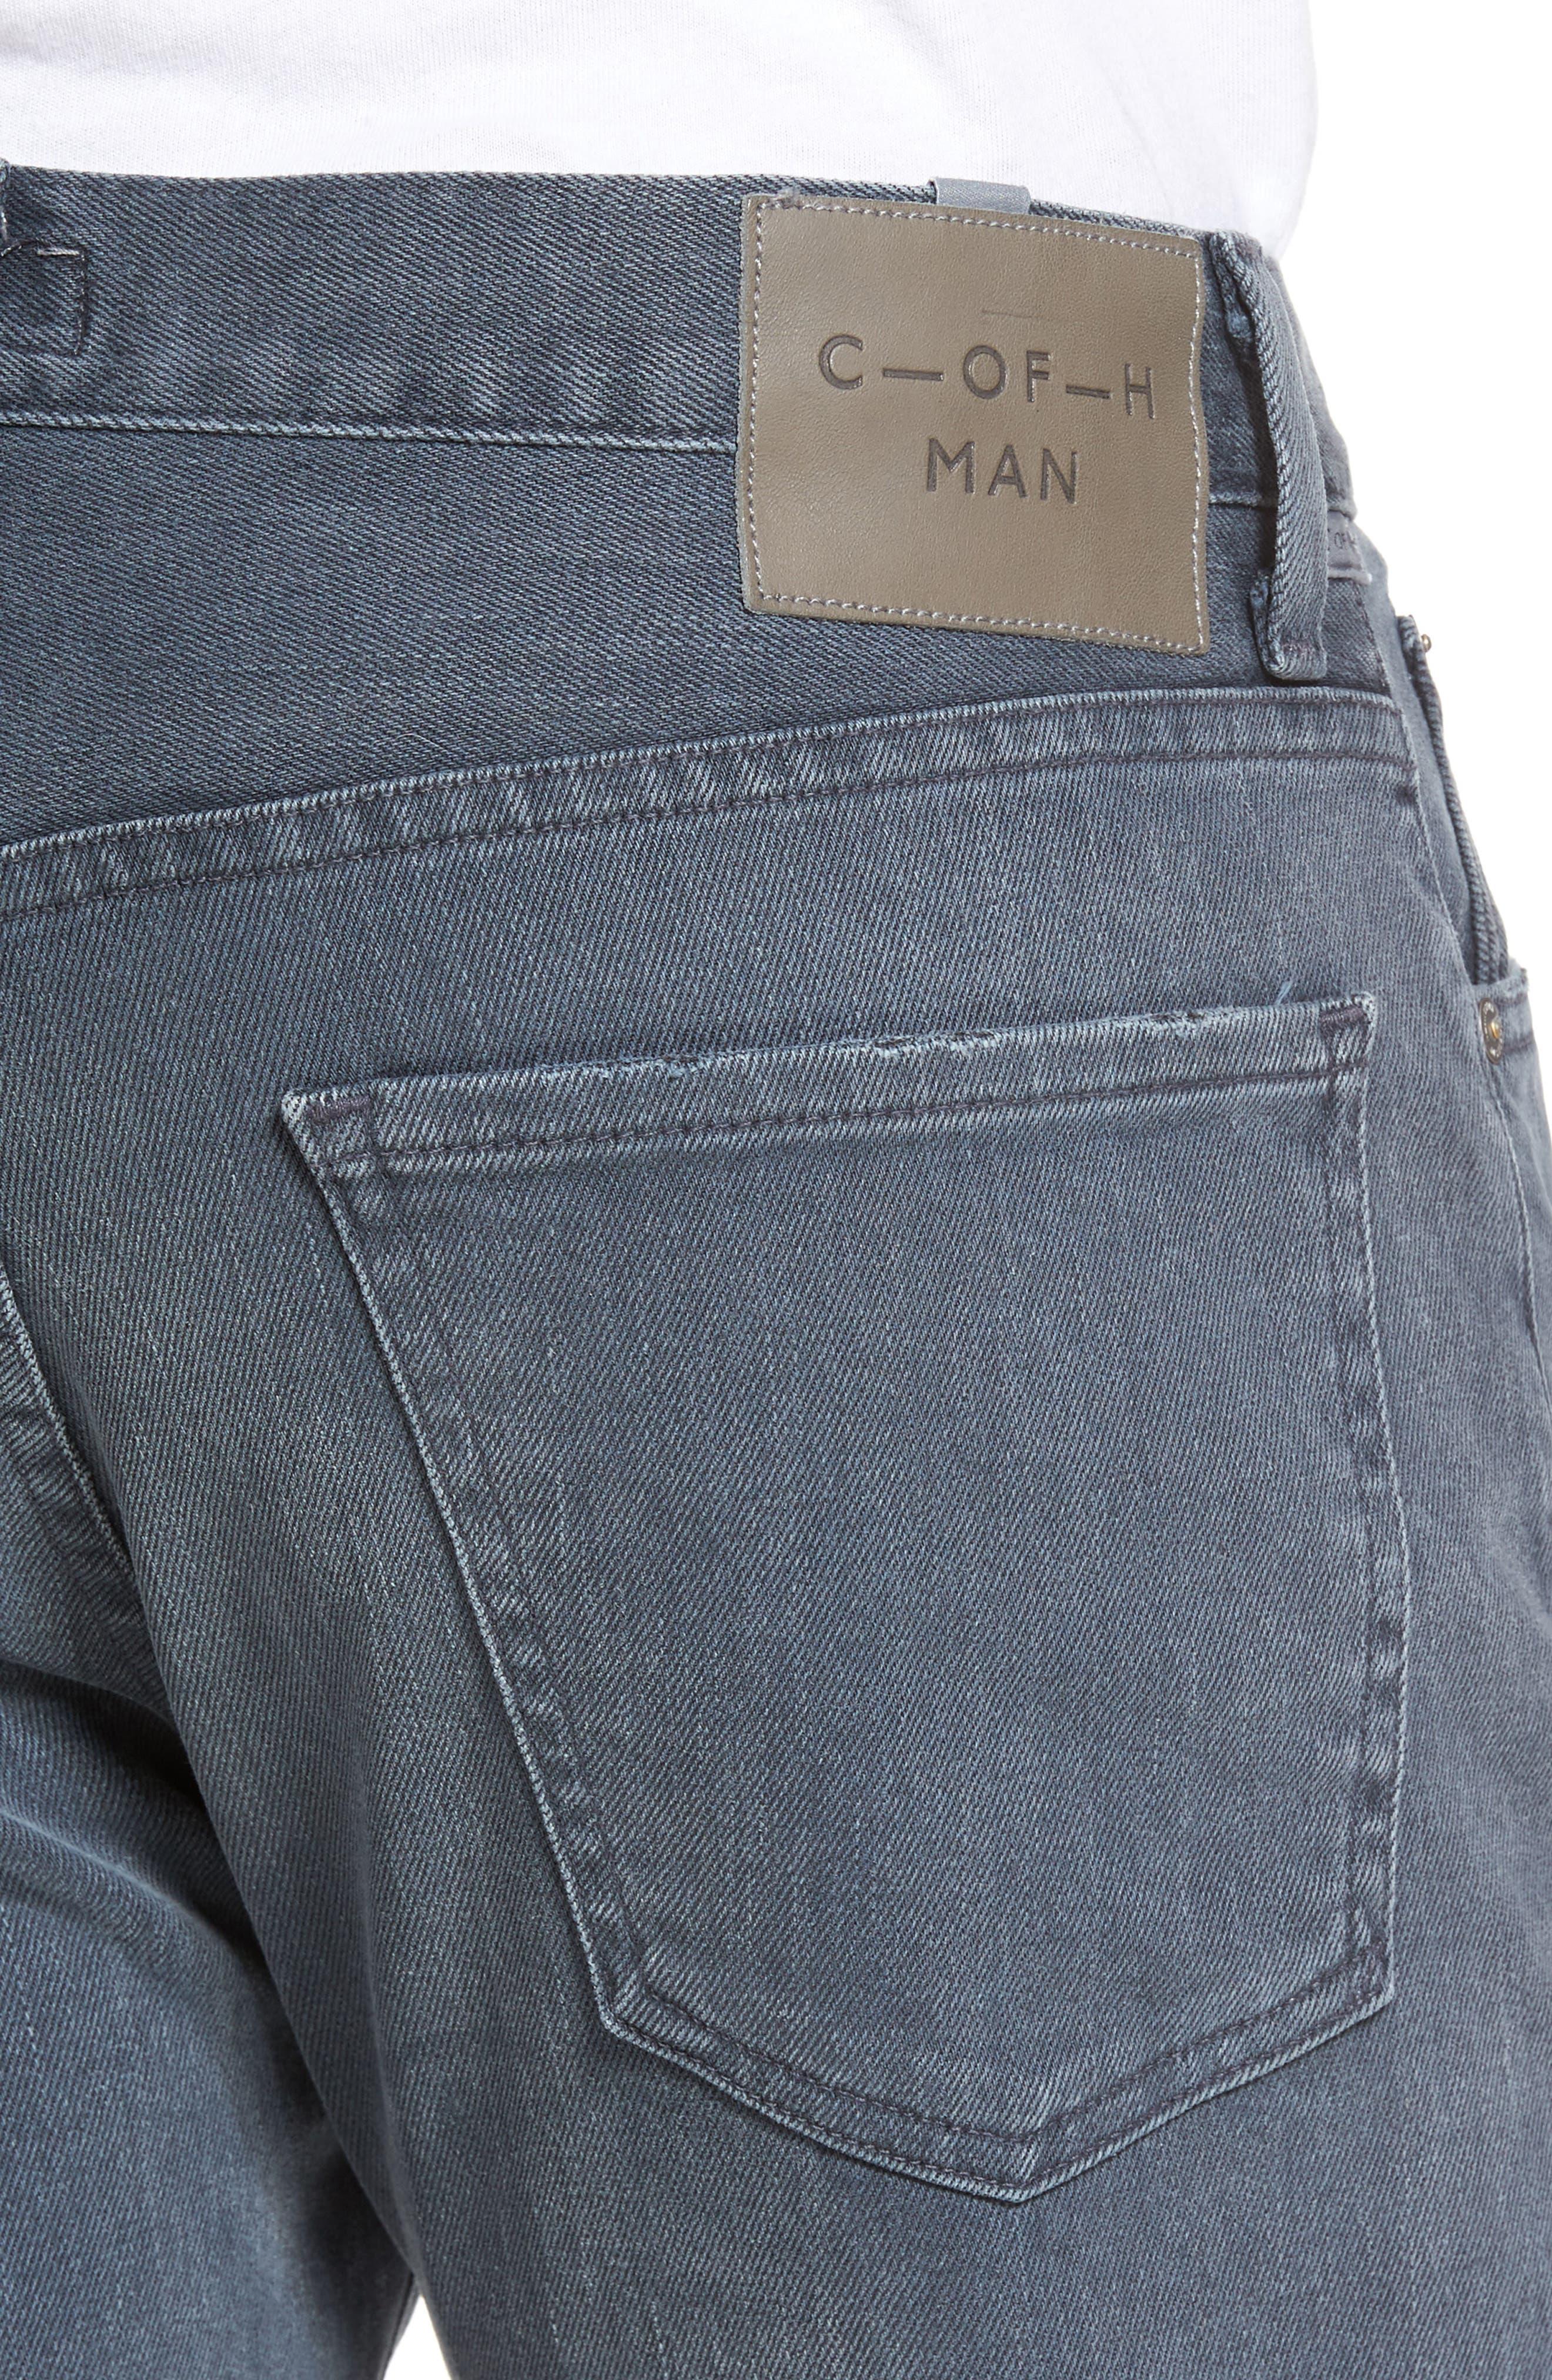 Core Slim Fit Jeans,                             Alternate thumbnail 4, color,                             GREY SKIES